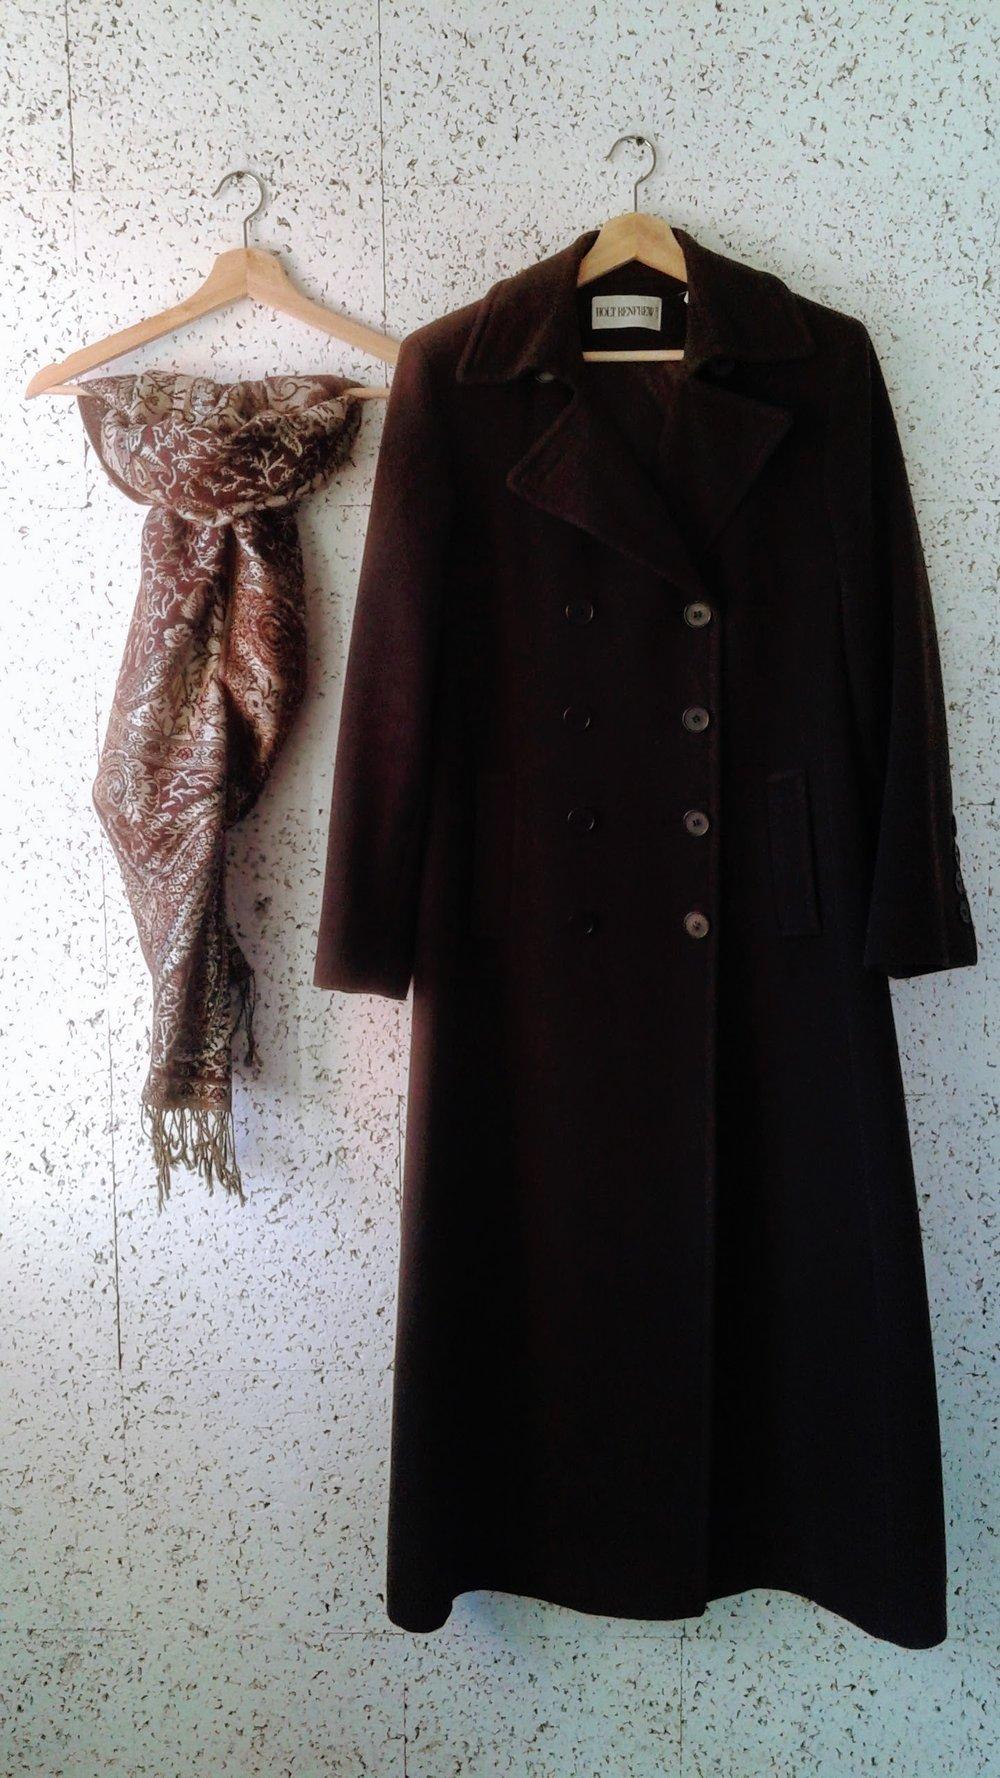 Holt Renfrew coat; Size 8, $110. Pashmina, $18